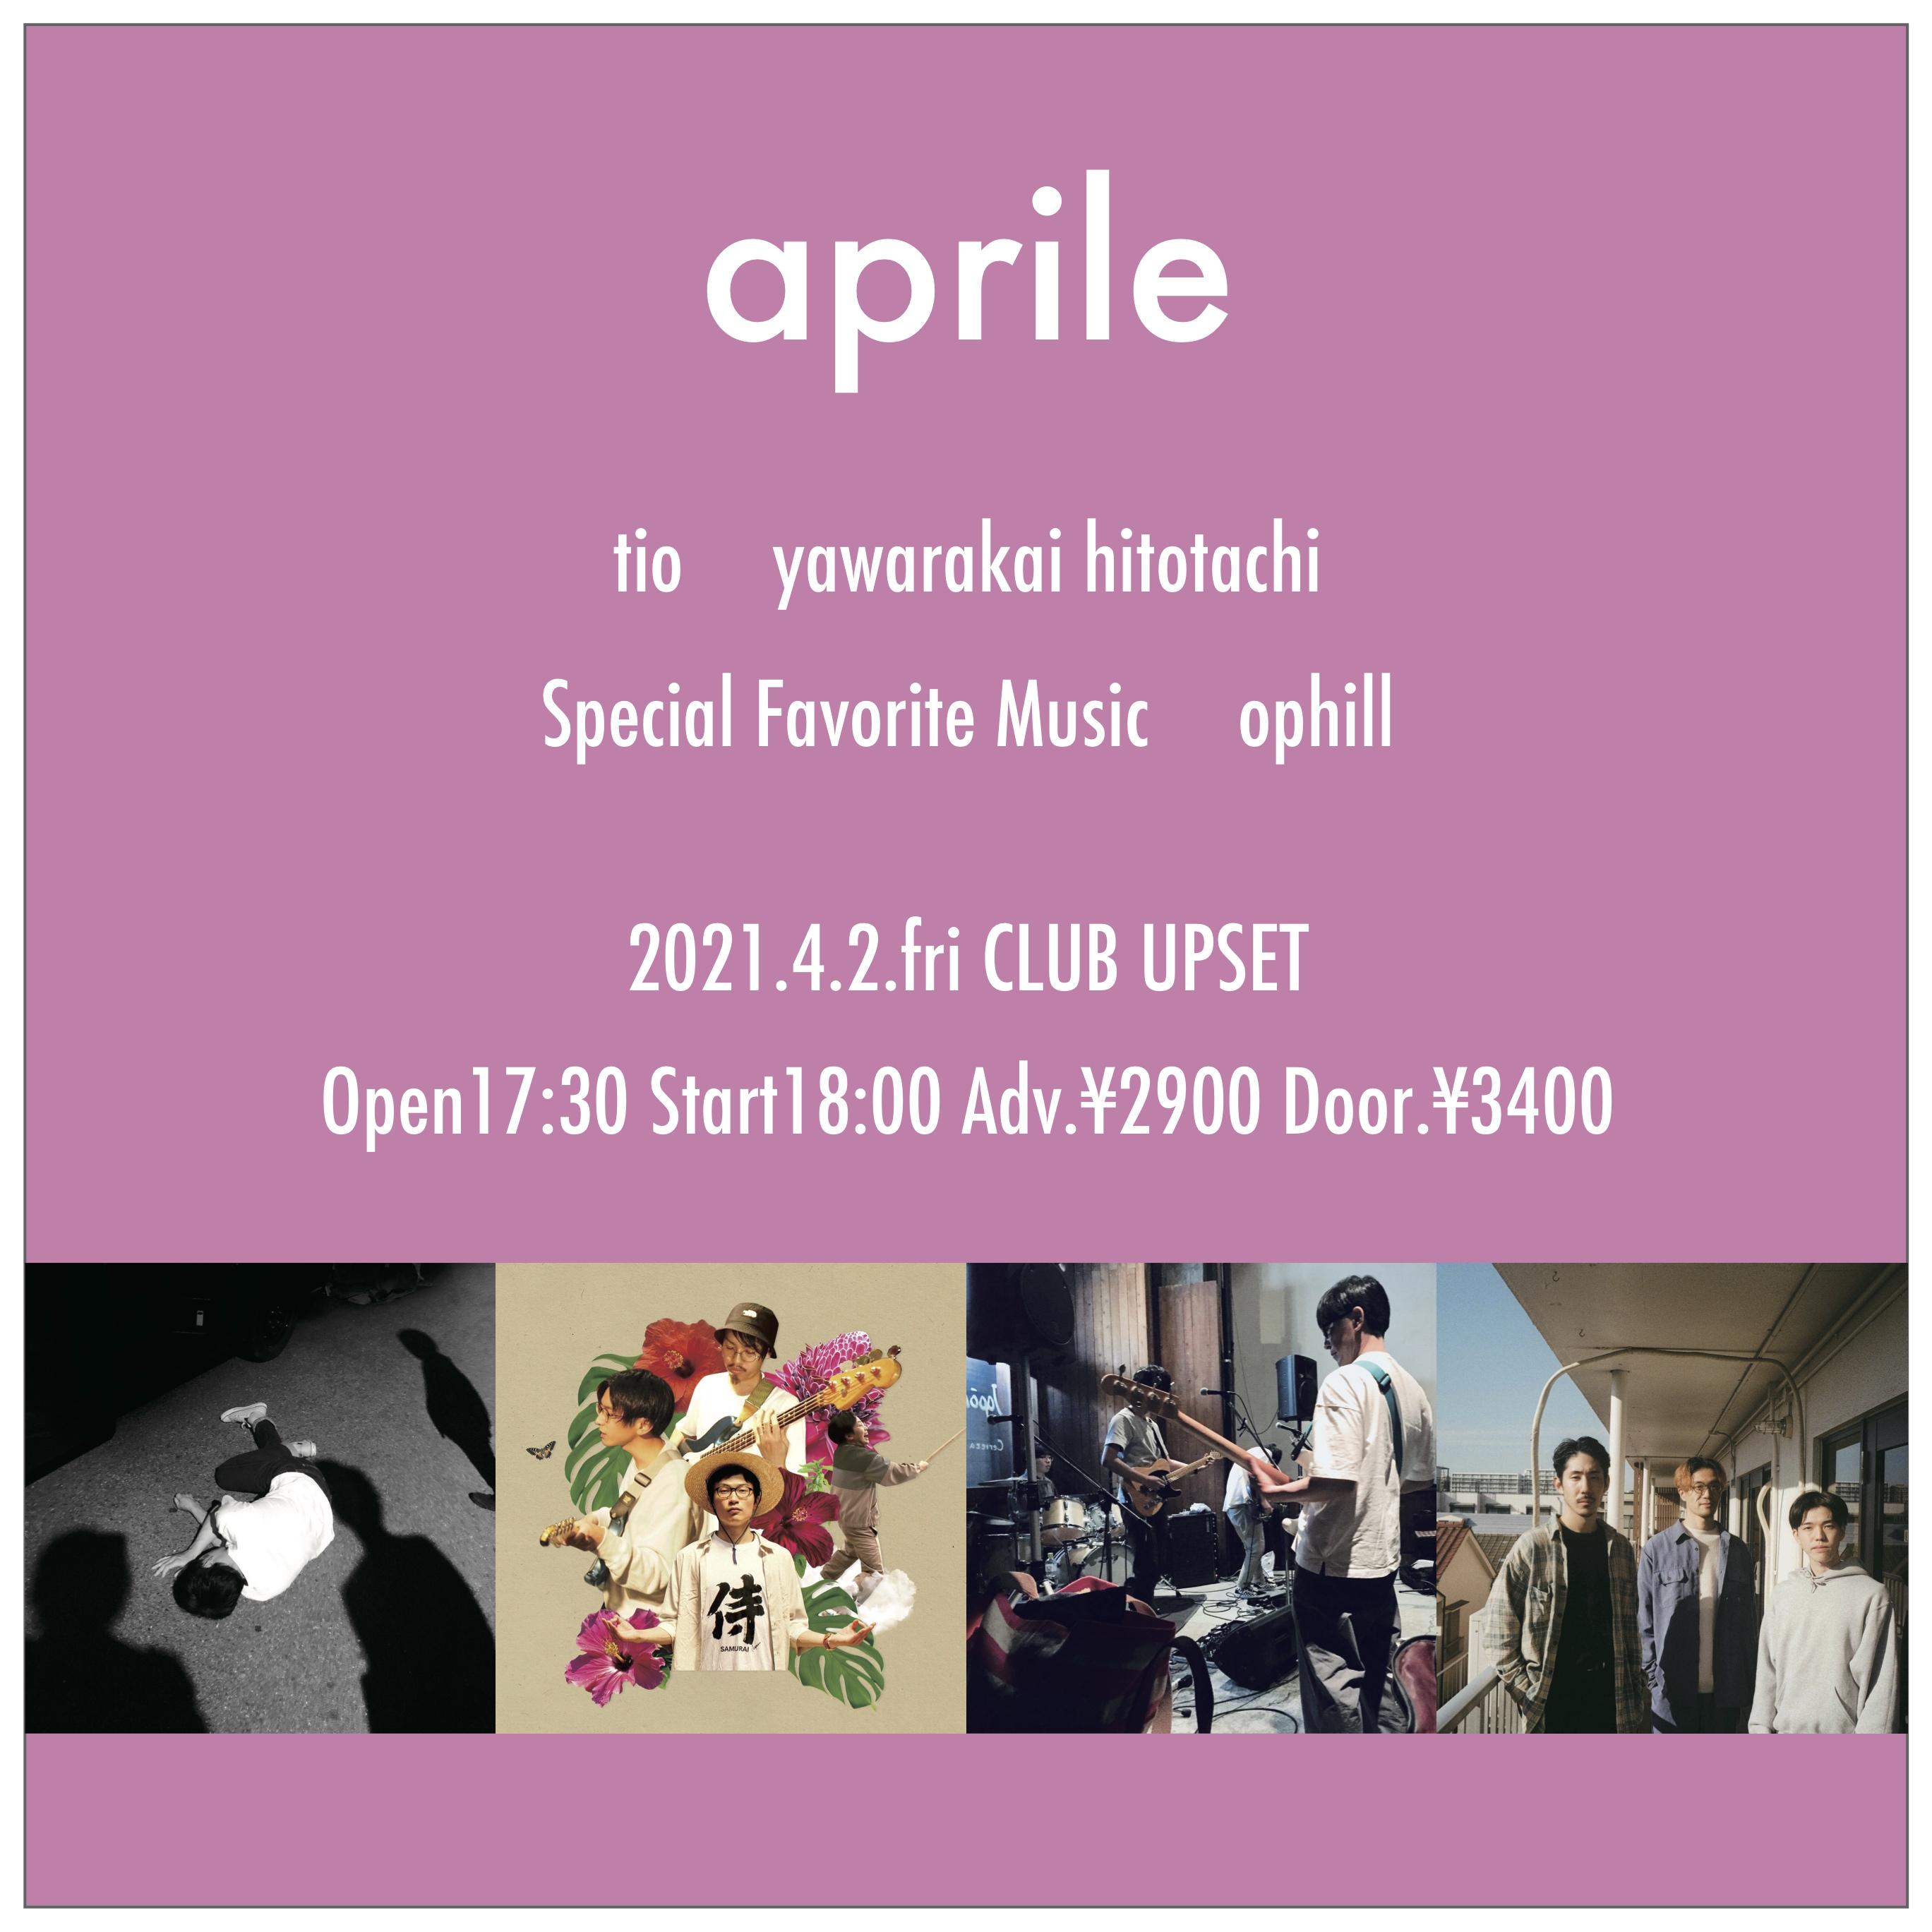 【CLUB UPSET】2021/4/2(金) aprile ライブチケット